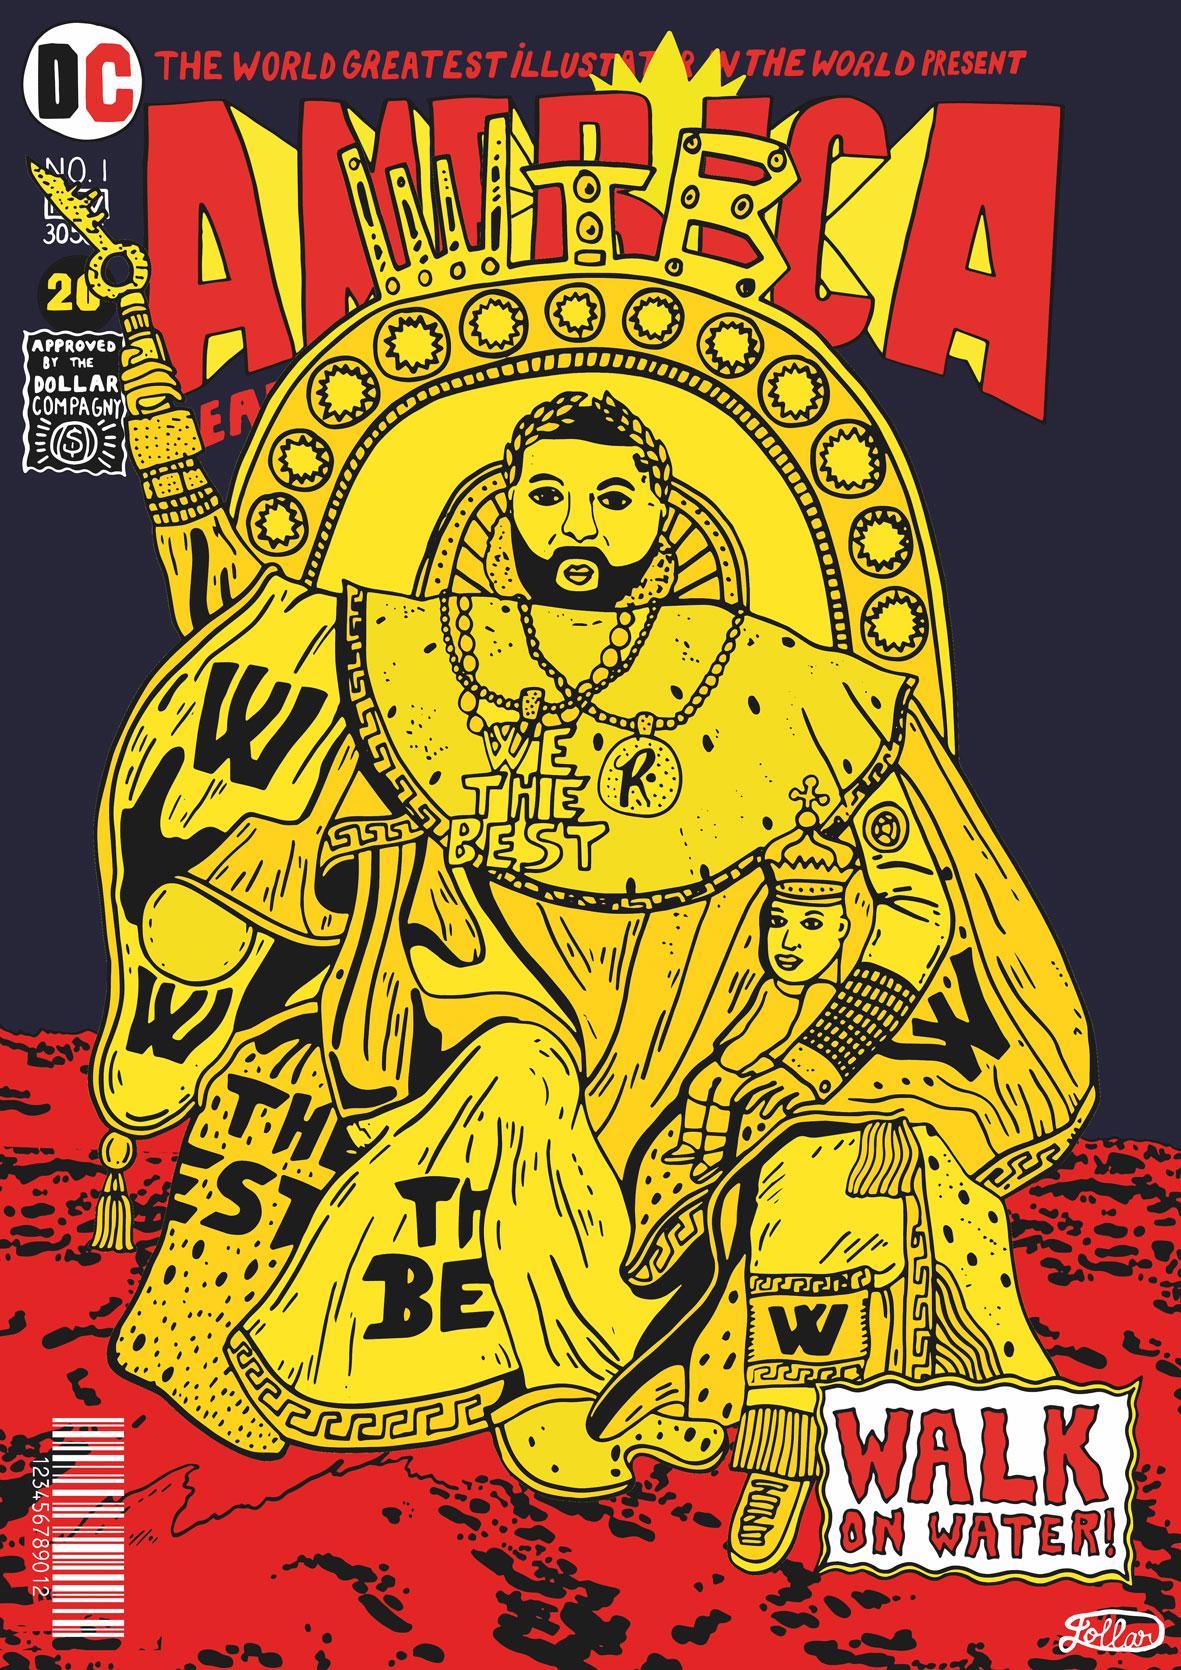 America-Real-Story-'Dj-Khaled'